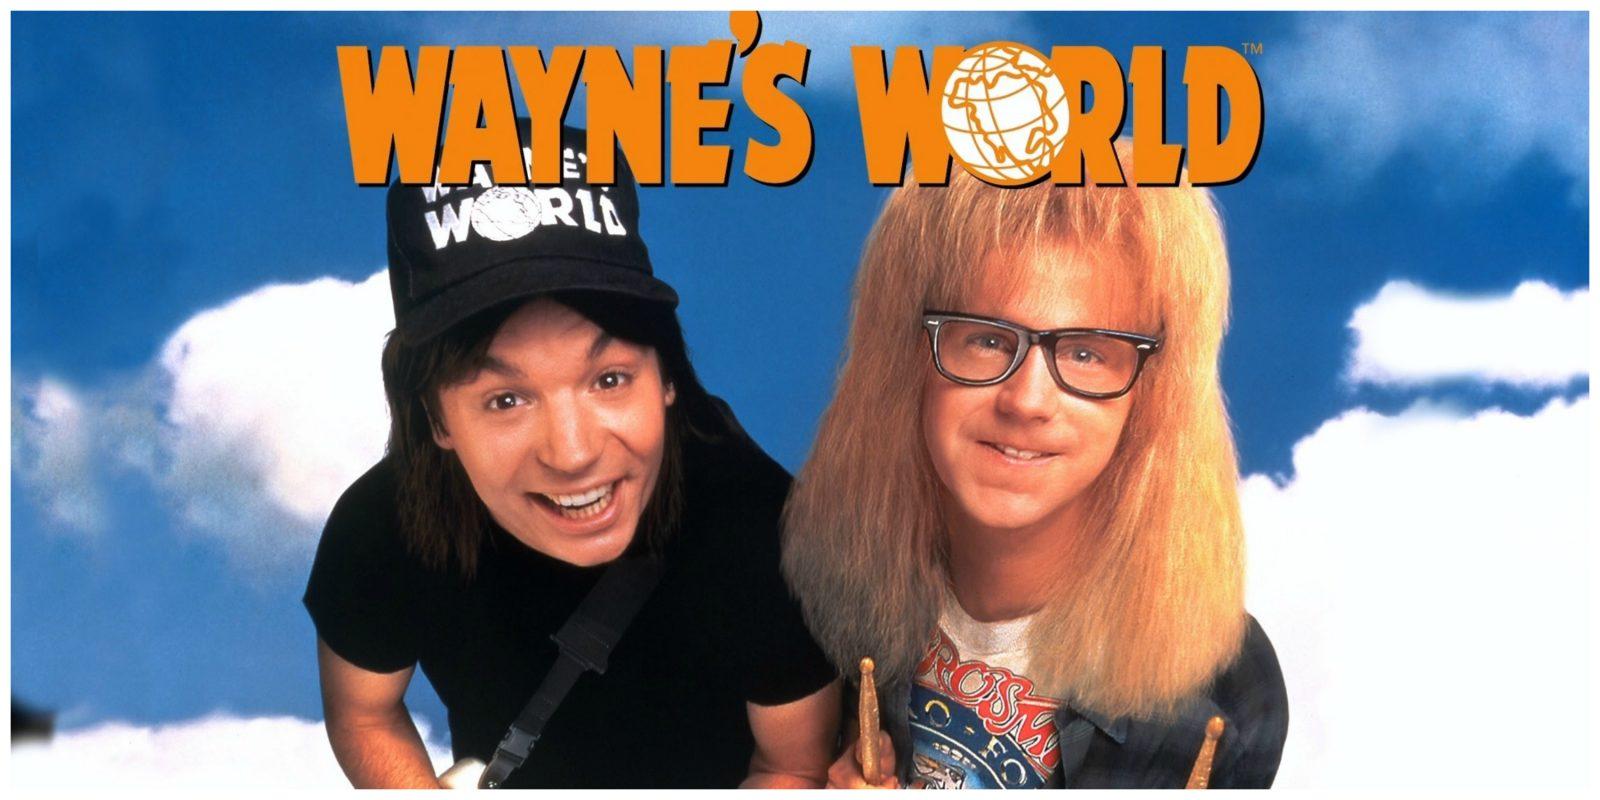 wayne's world header